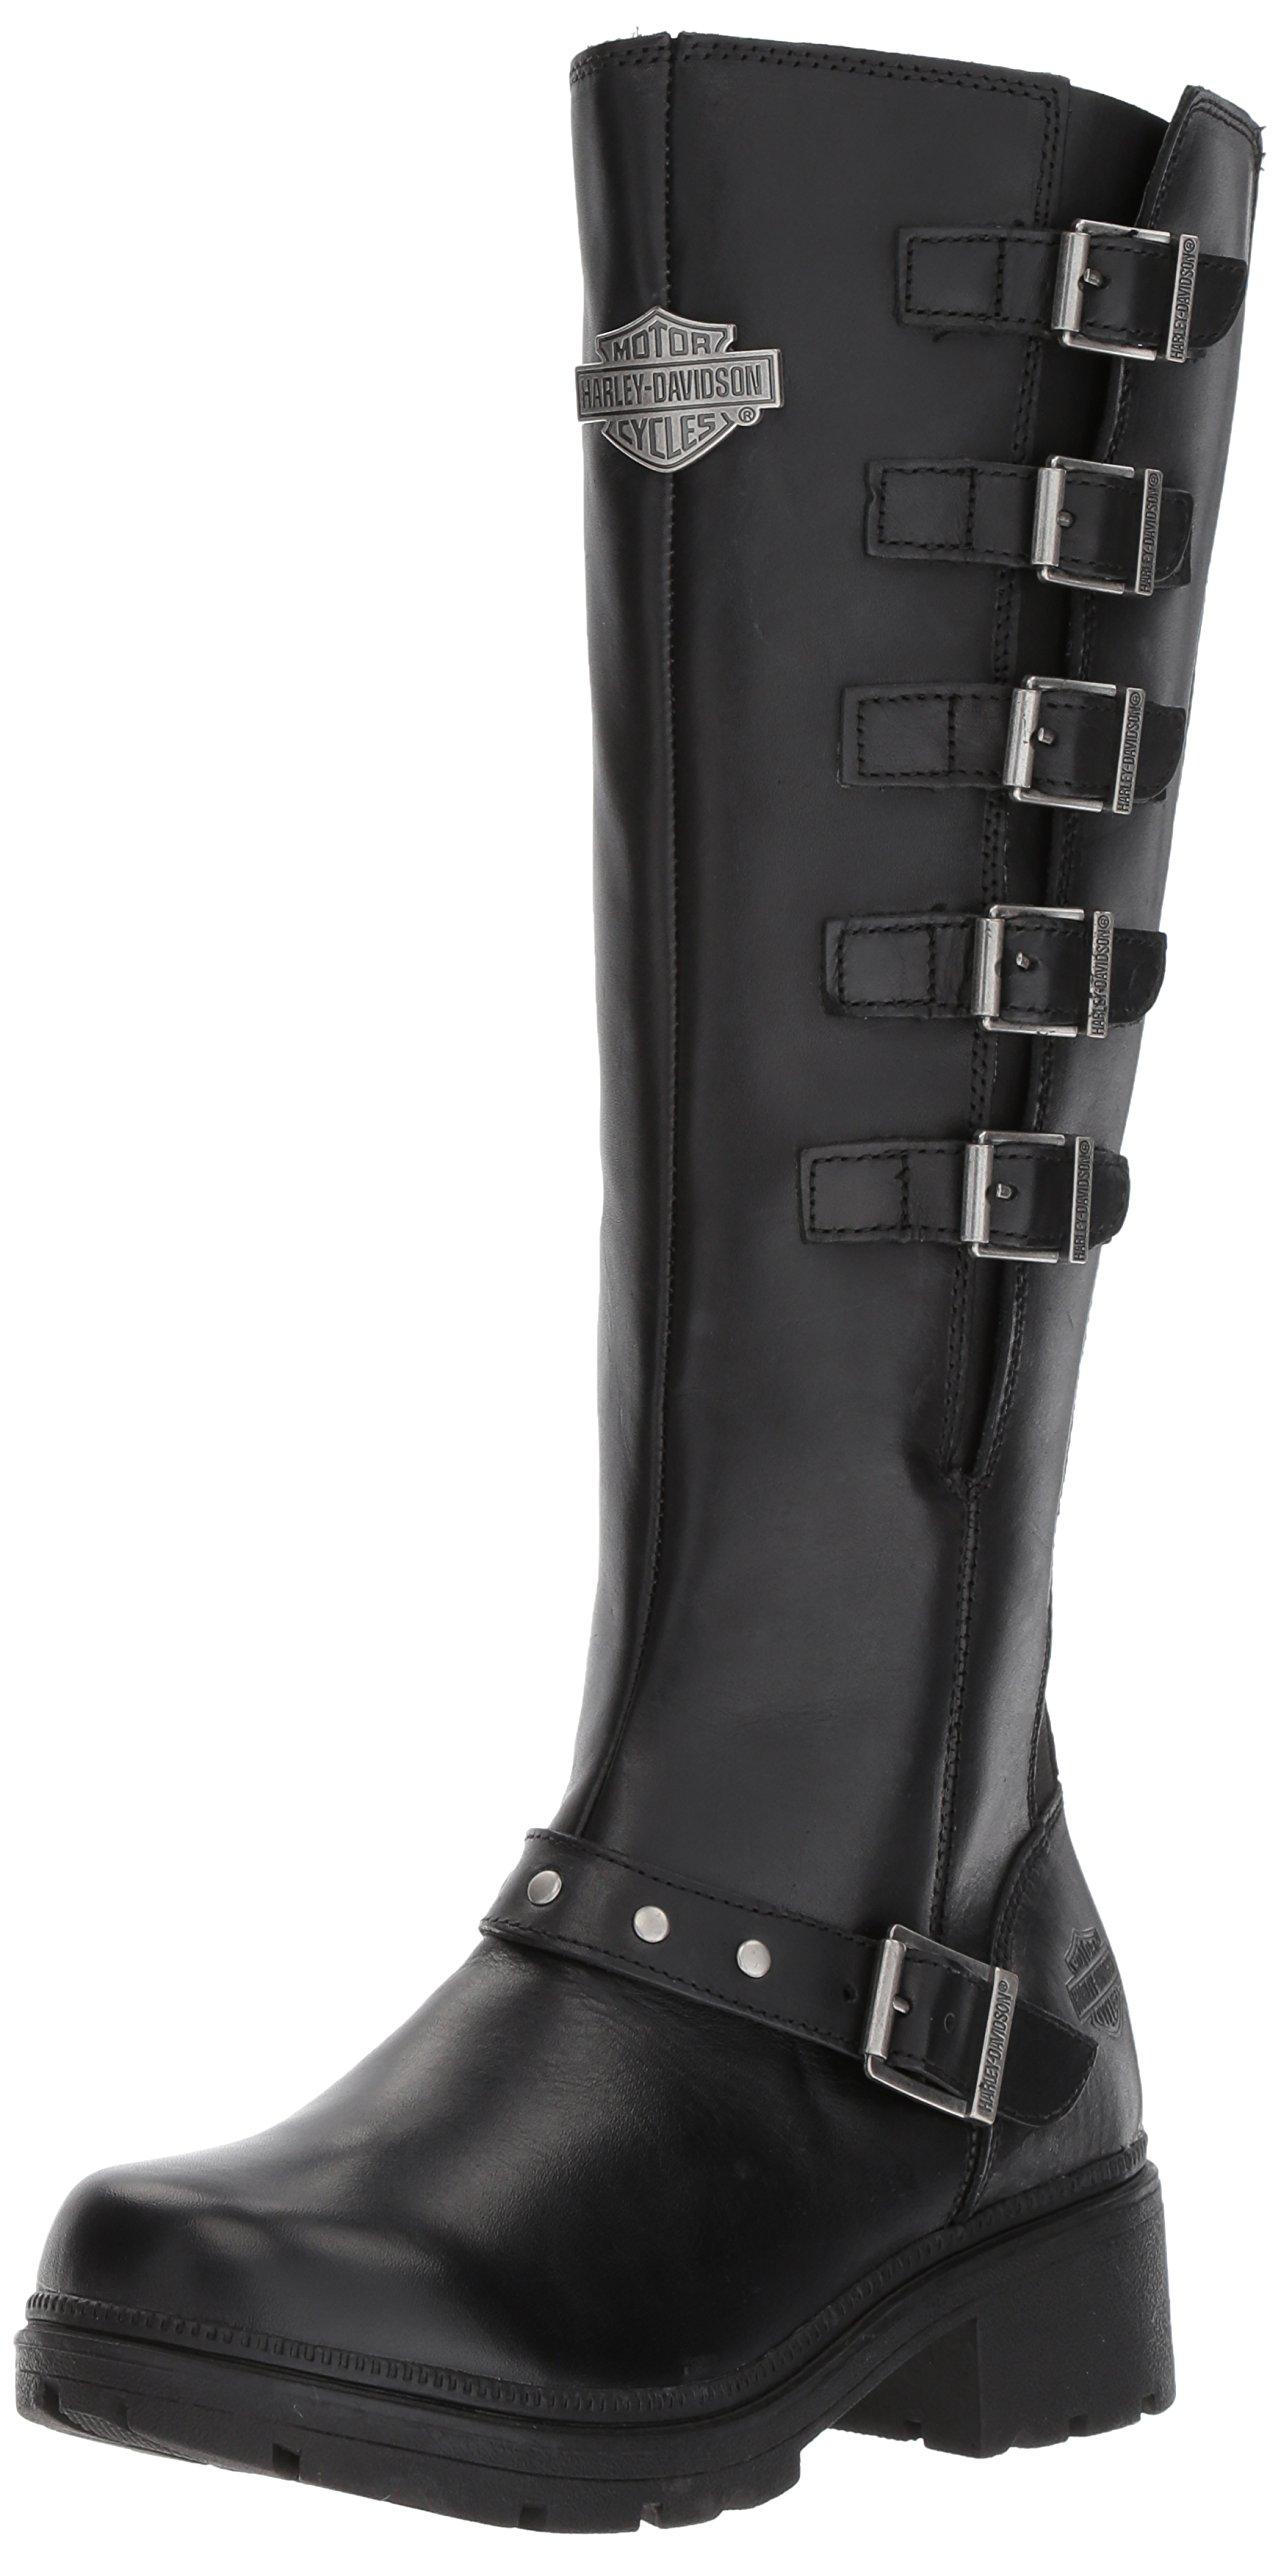 Harley-Davidson Women's Glassford Work Boot, Black, 10 M US by Harley-Davidson